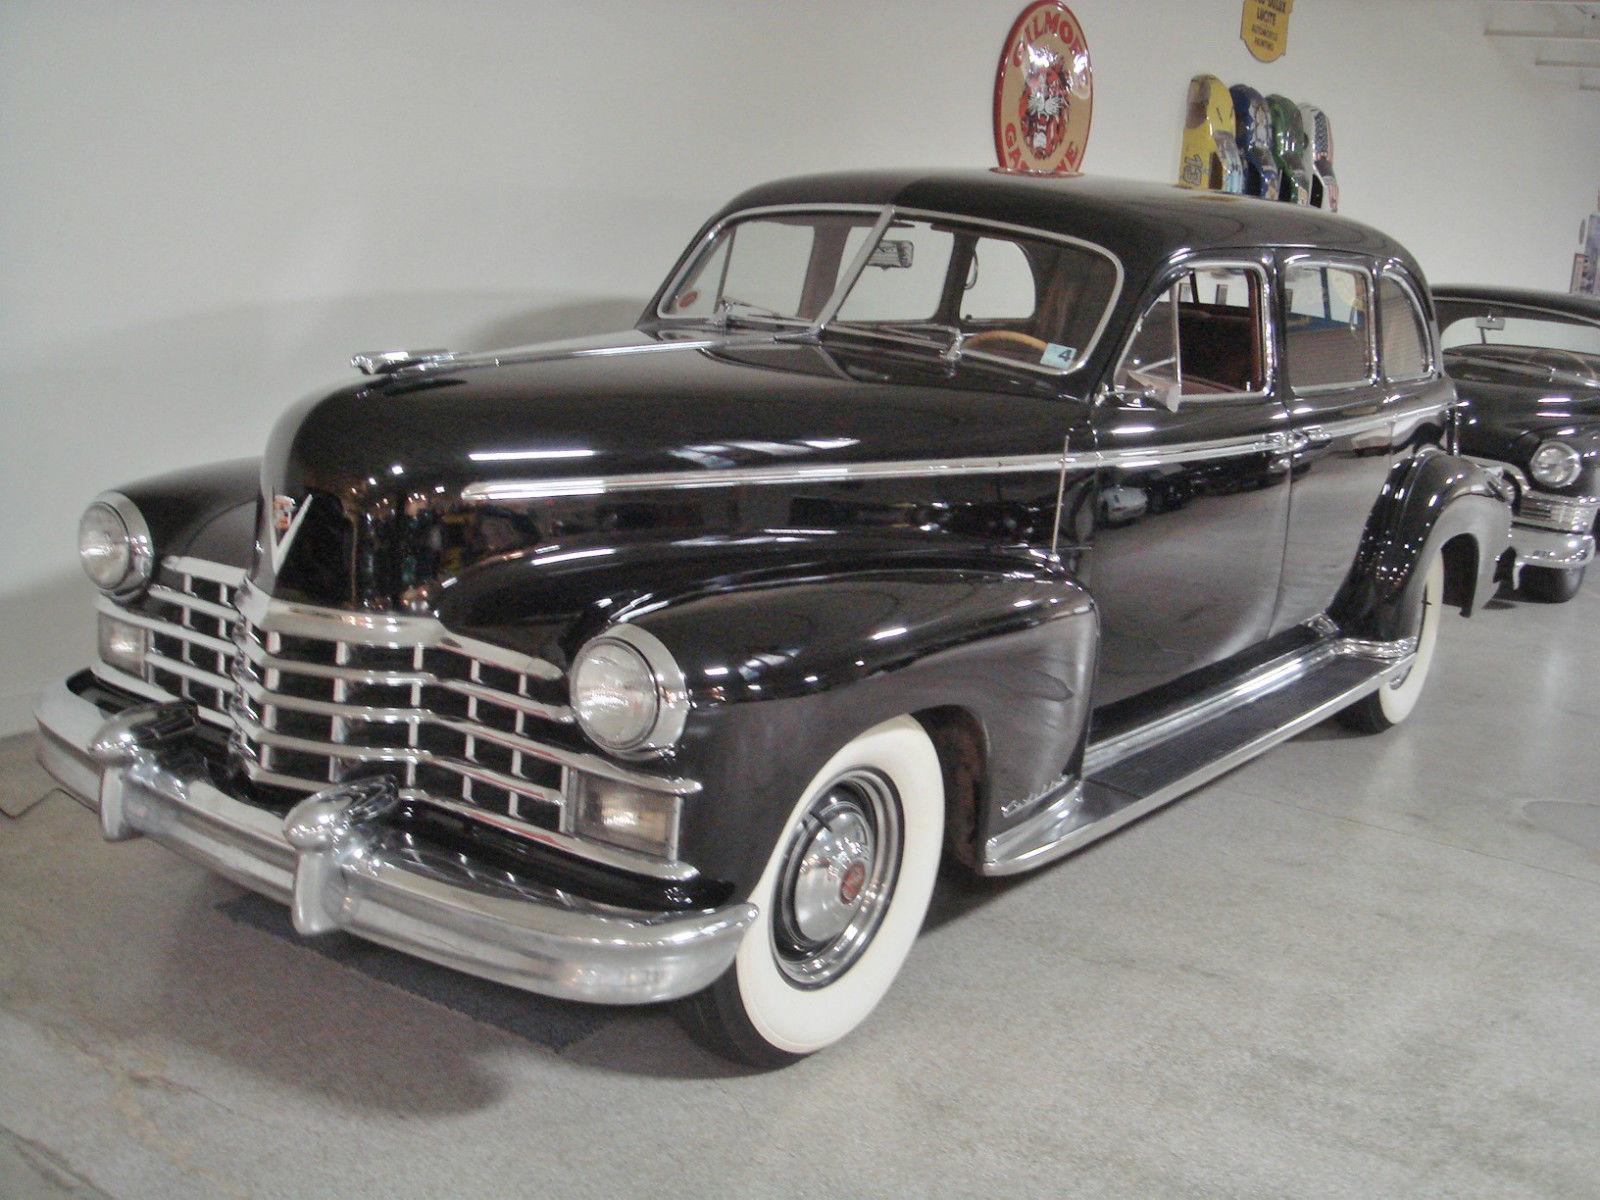 1949 cadillac fleetwood 7 passenger sedan great survivor for 1949 cadillac 4 door sedan